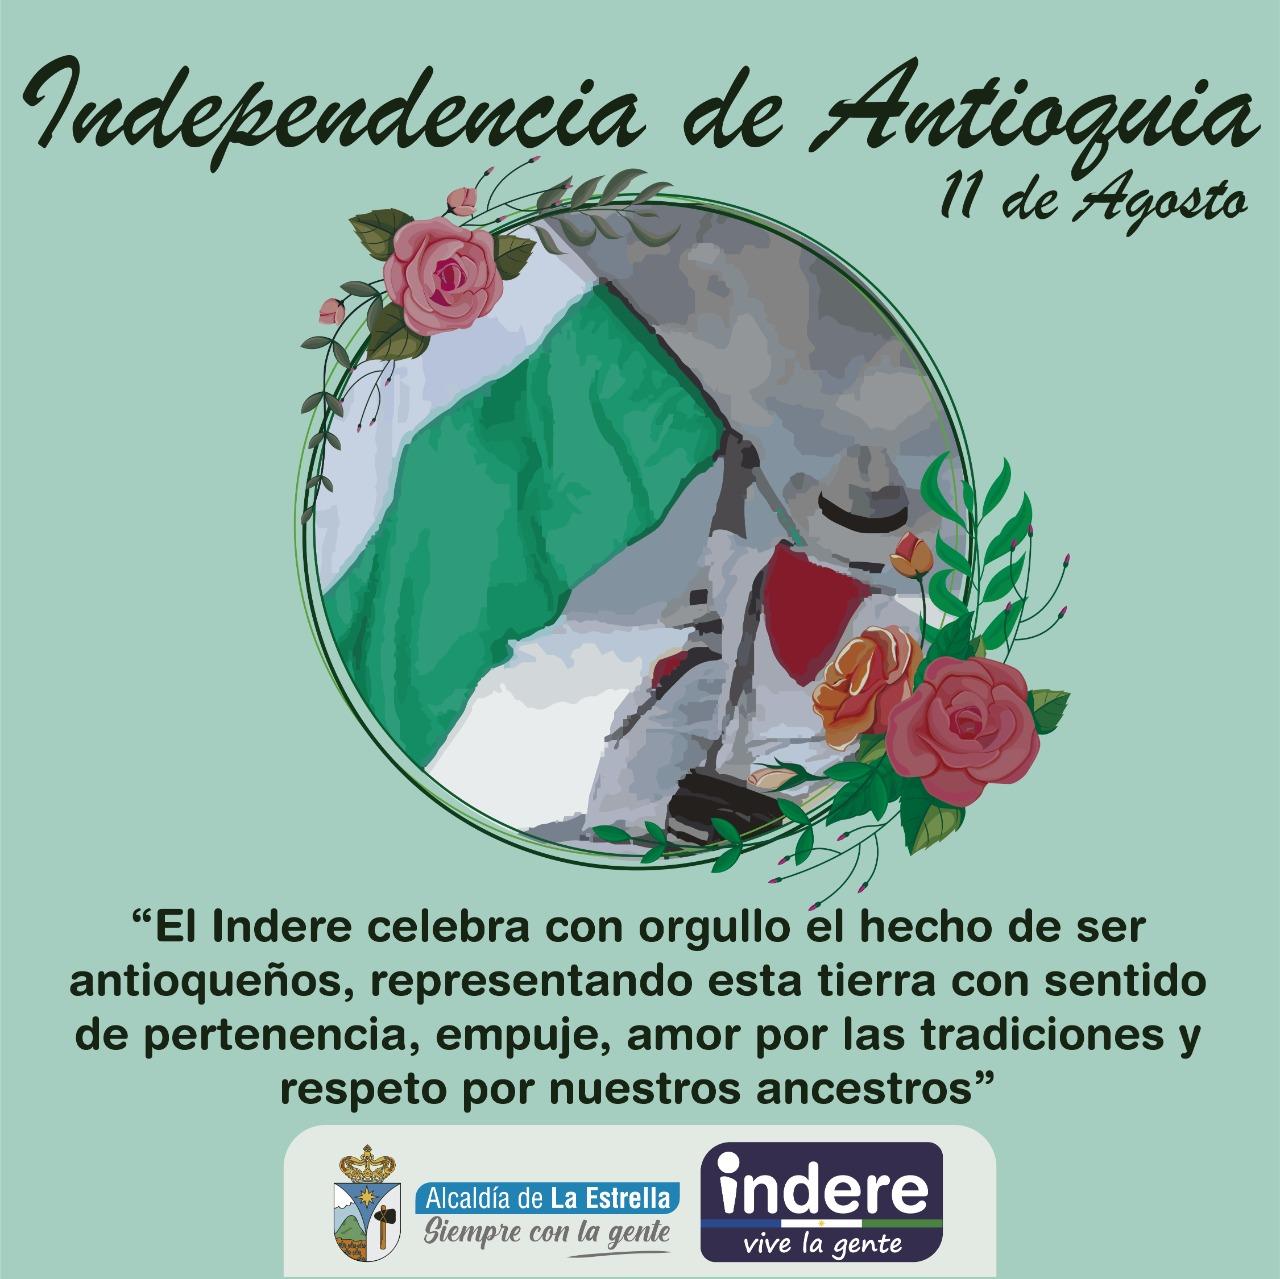 Independencia de Antioquia 11 de agosto